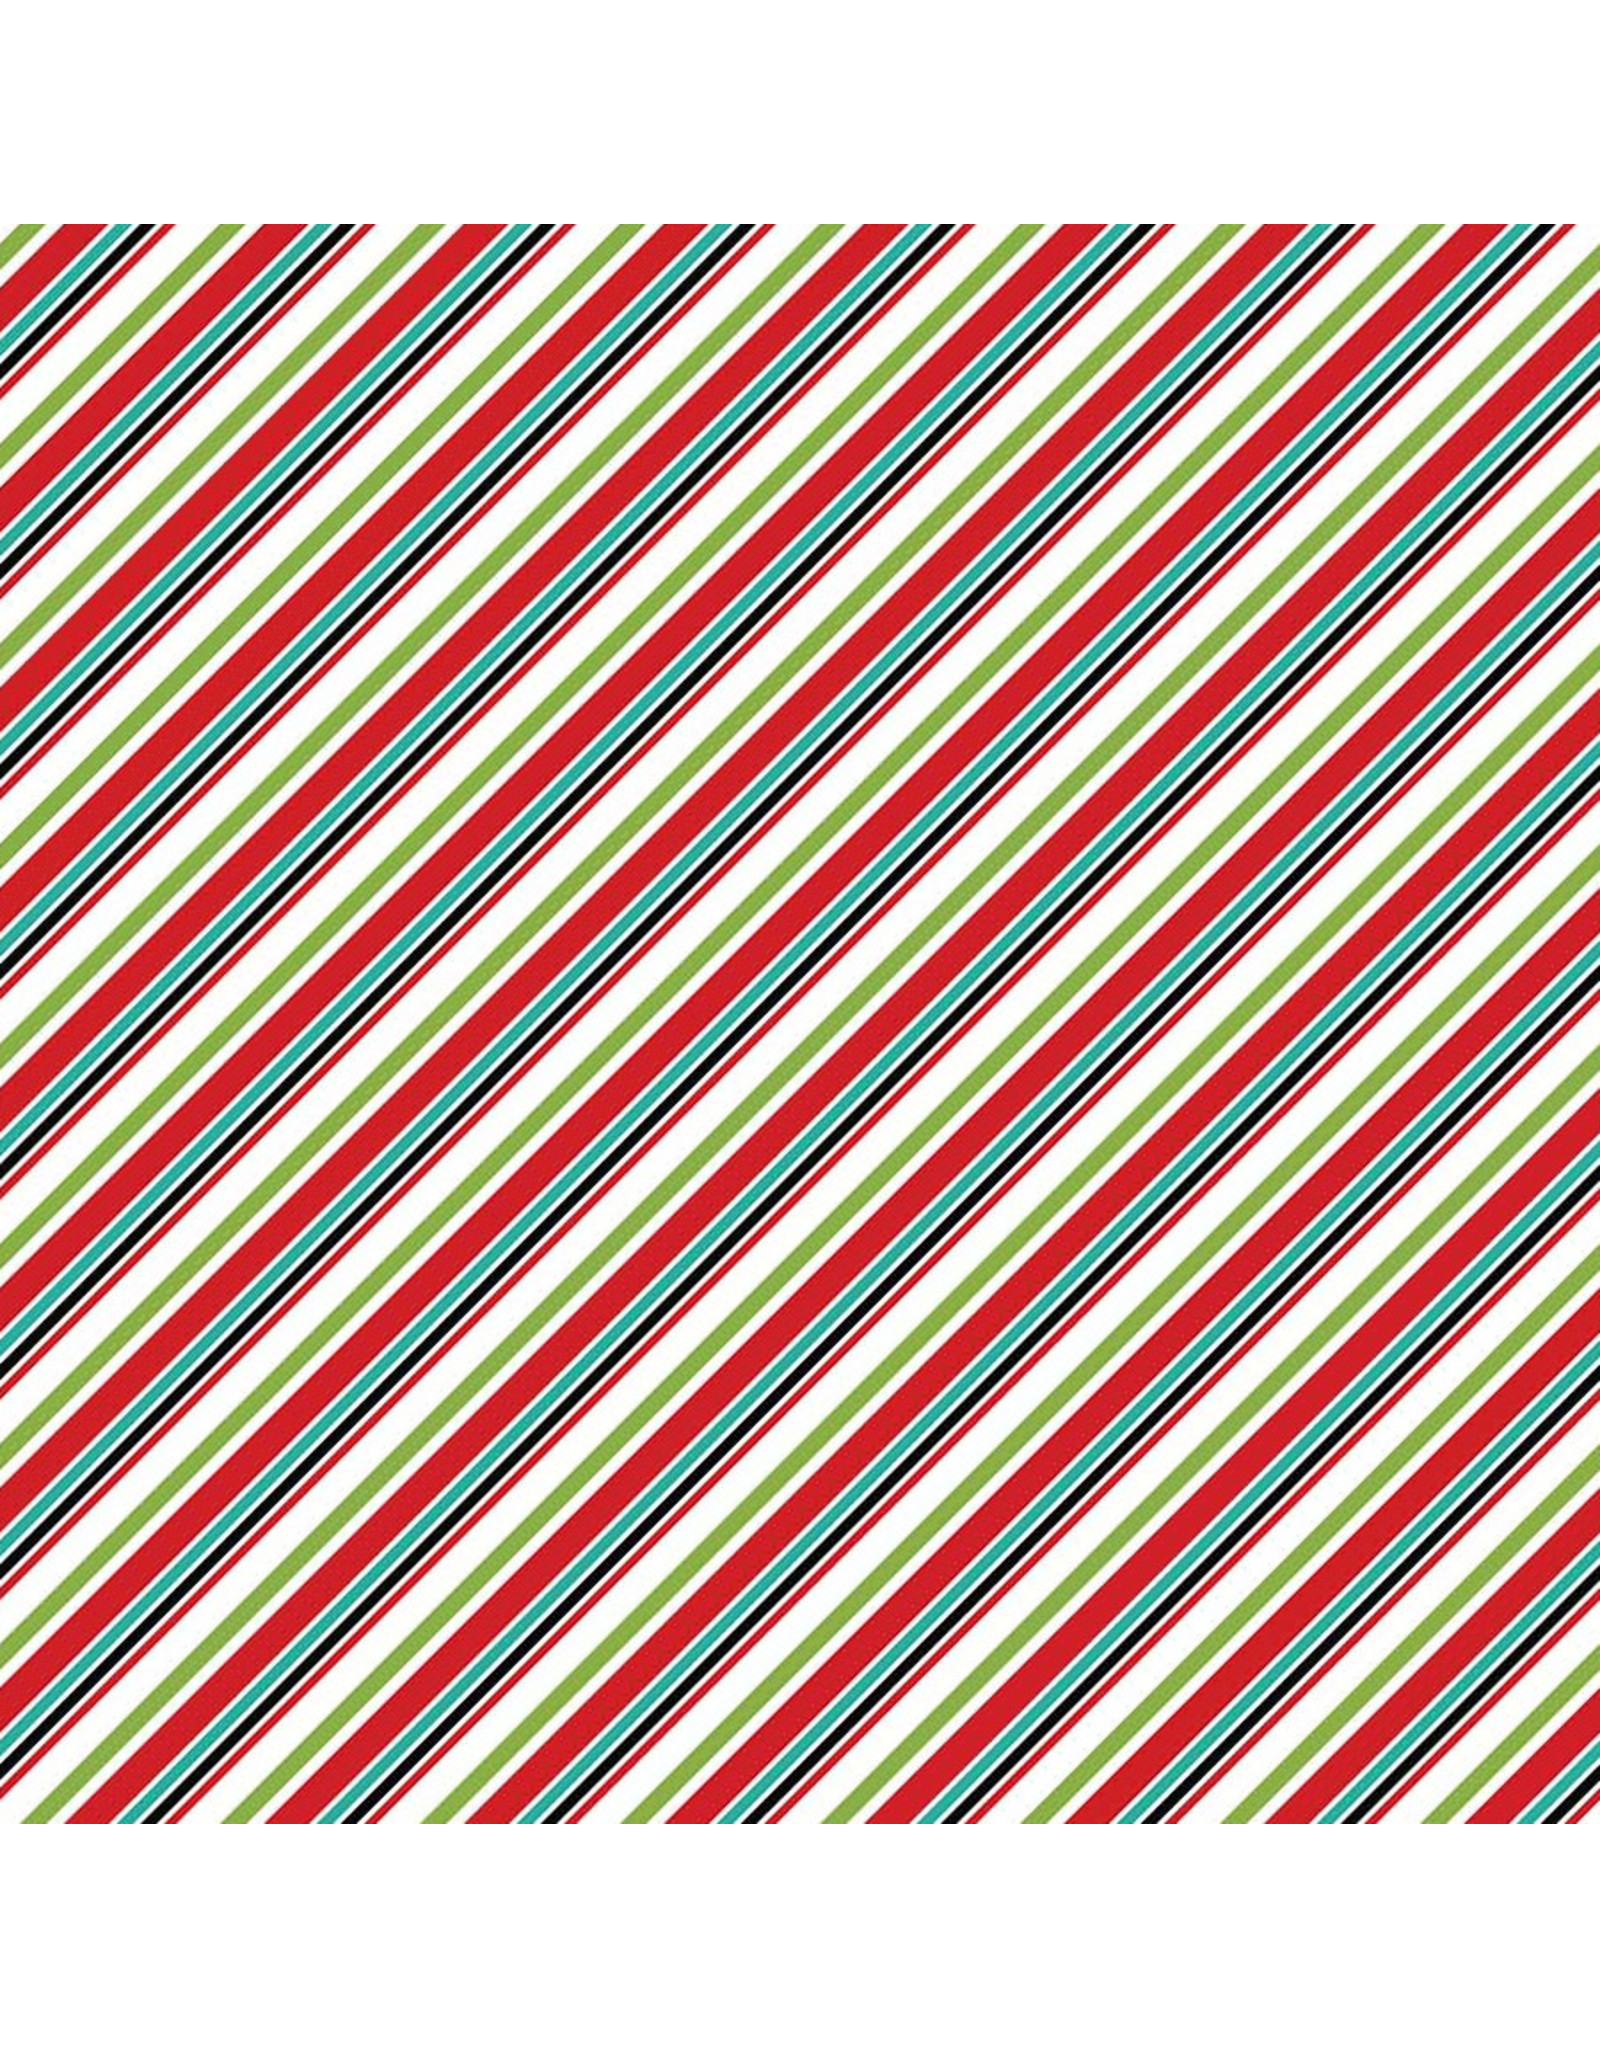 Northcott Santa Paws, Diagonal Stripe in White Multi, Fabric Half-Yards